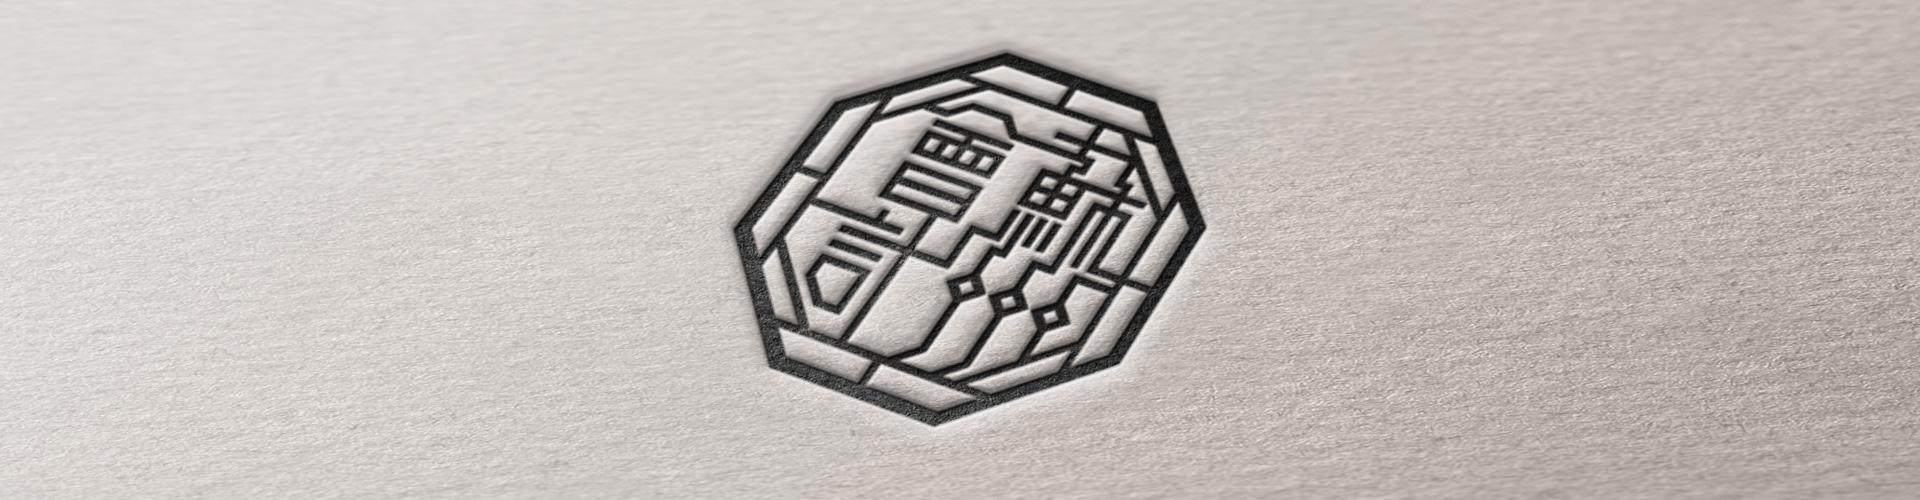 logo-suzhoukuaiji_01